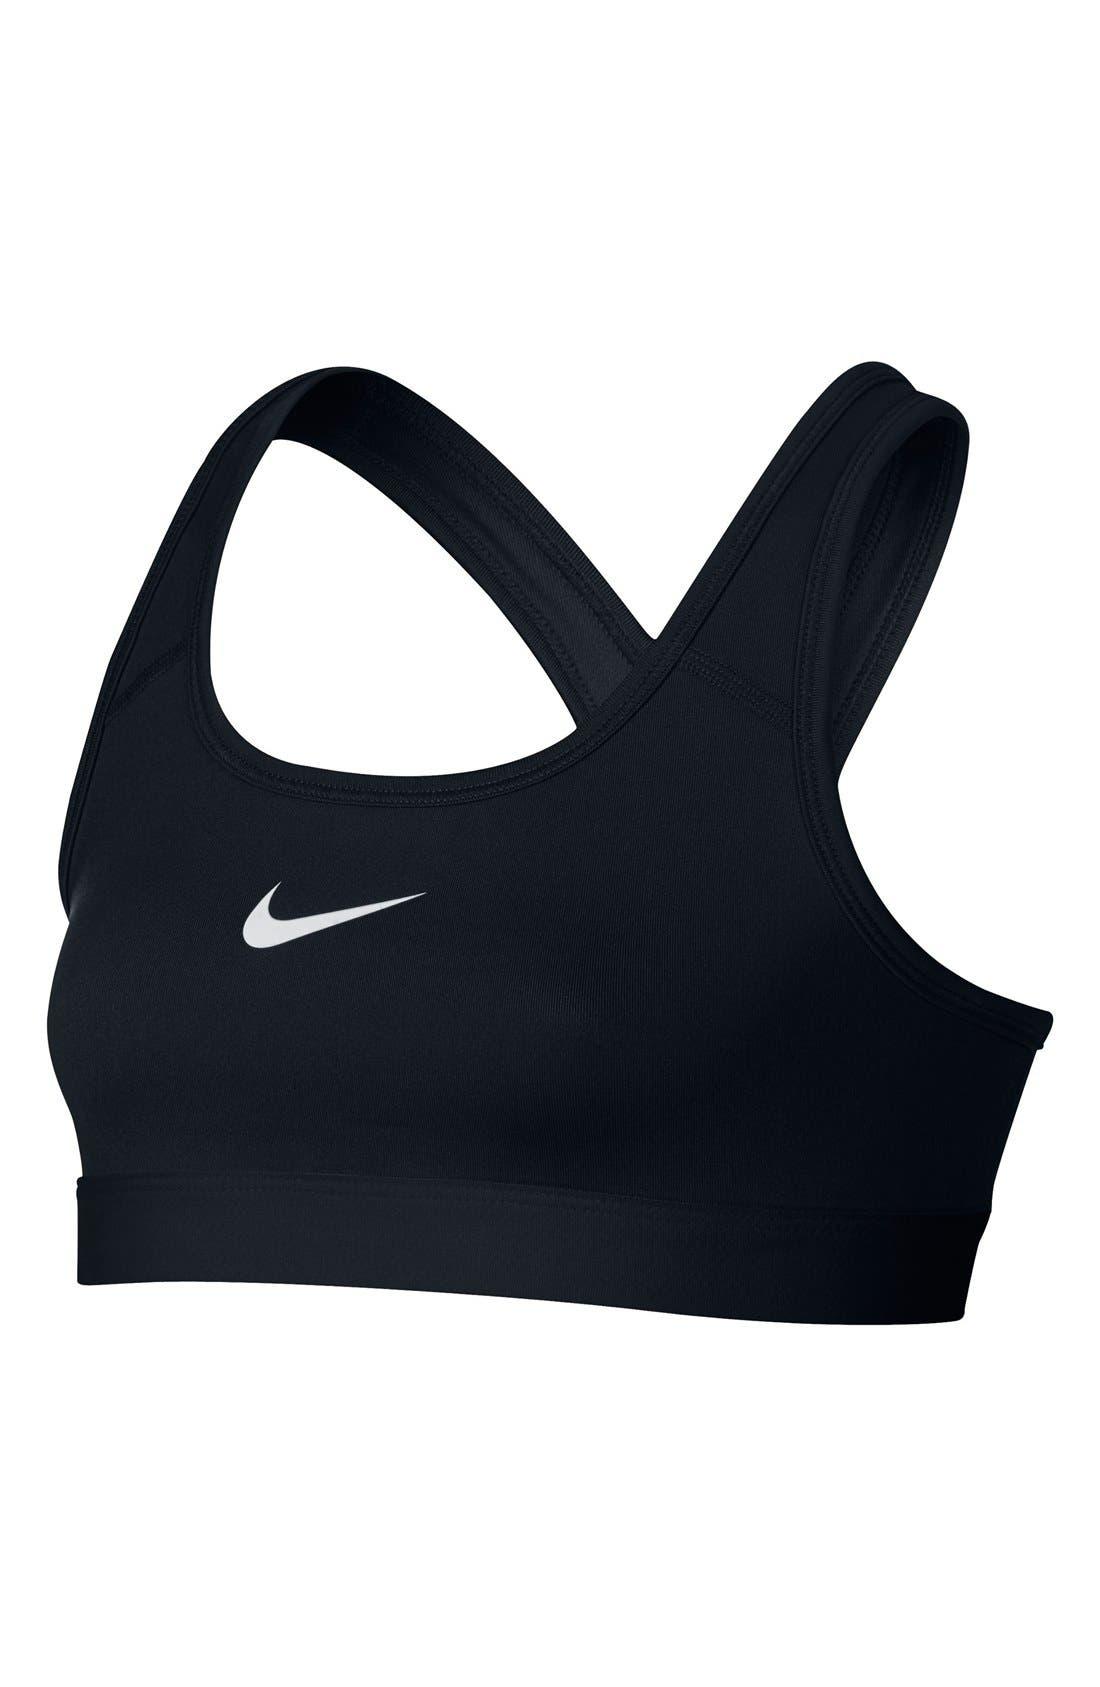 Main Image - Nike 'Pro Classic' Dri-FIT Sports Bra (Big Girls)